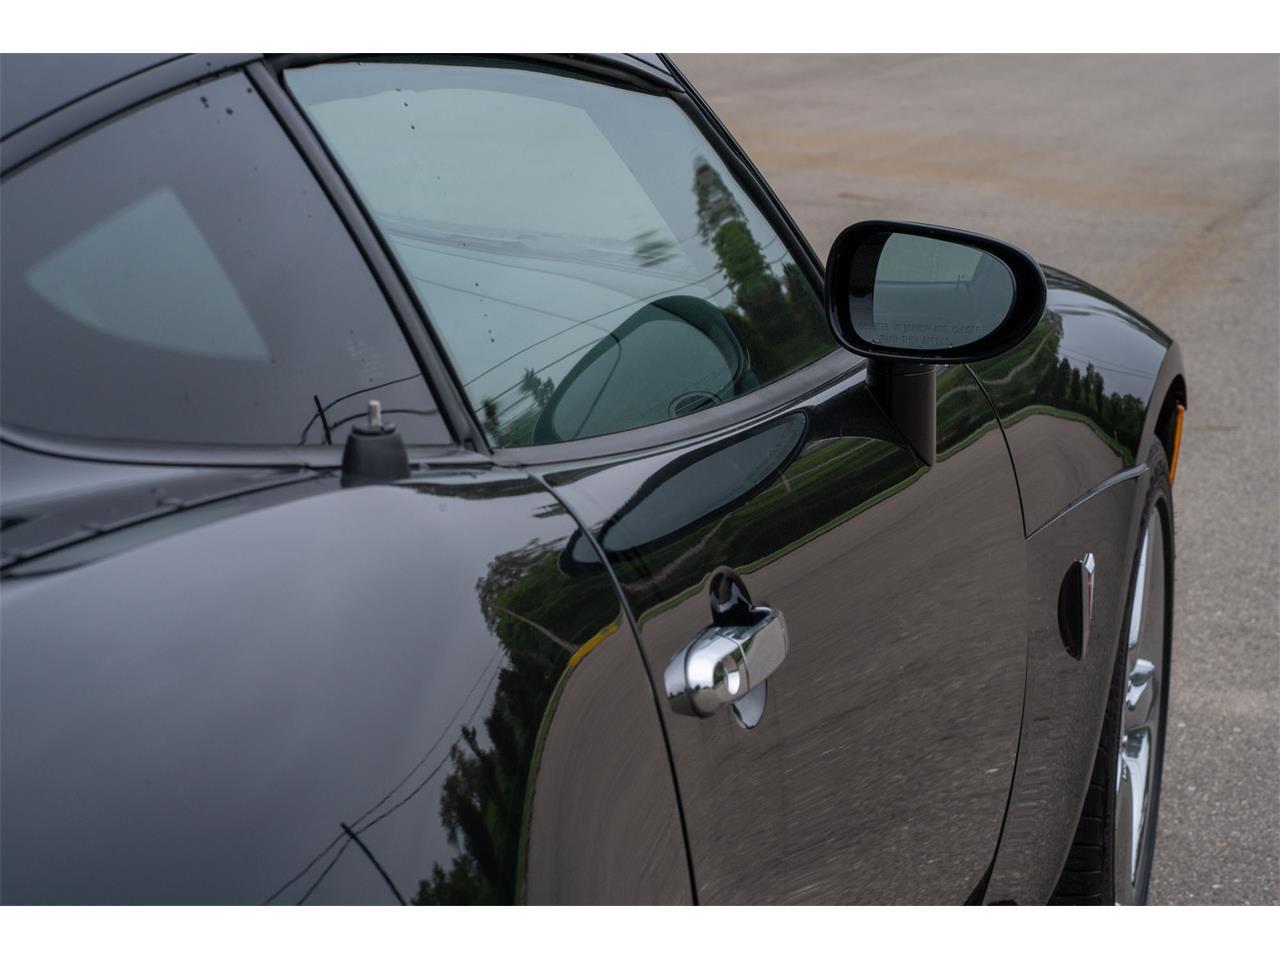 2009 Pontiac Solstice (CC-1392633) for sale in Milford, Michigan